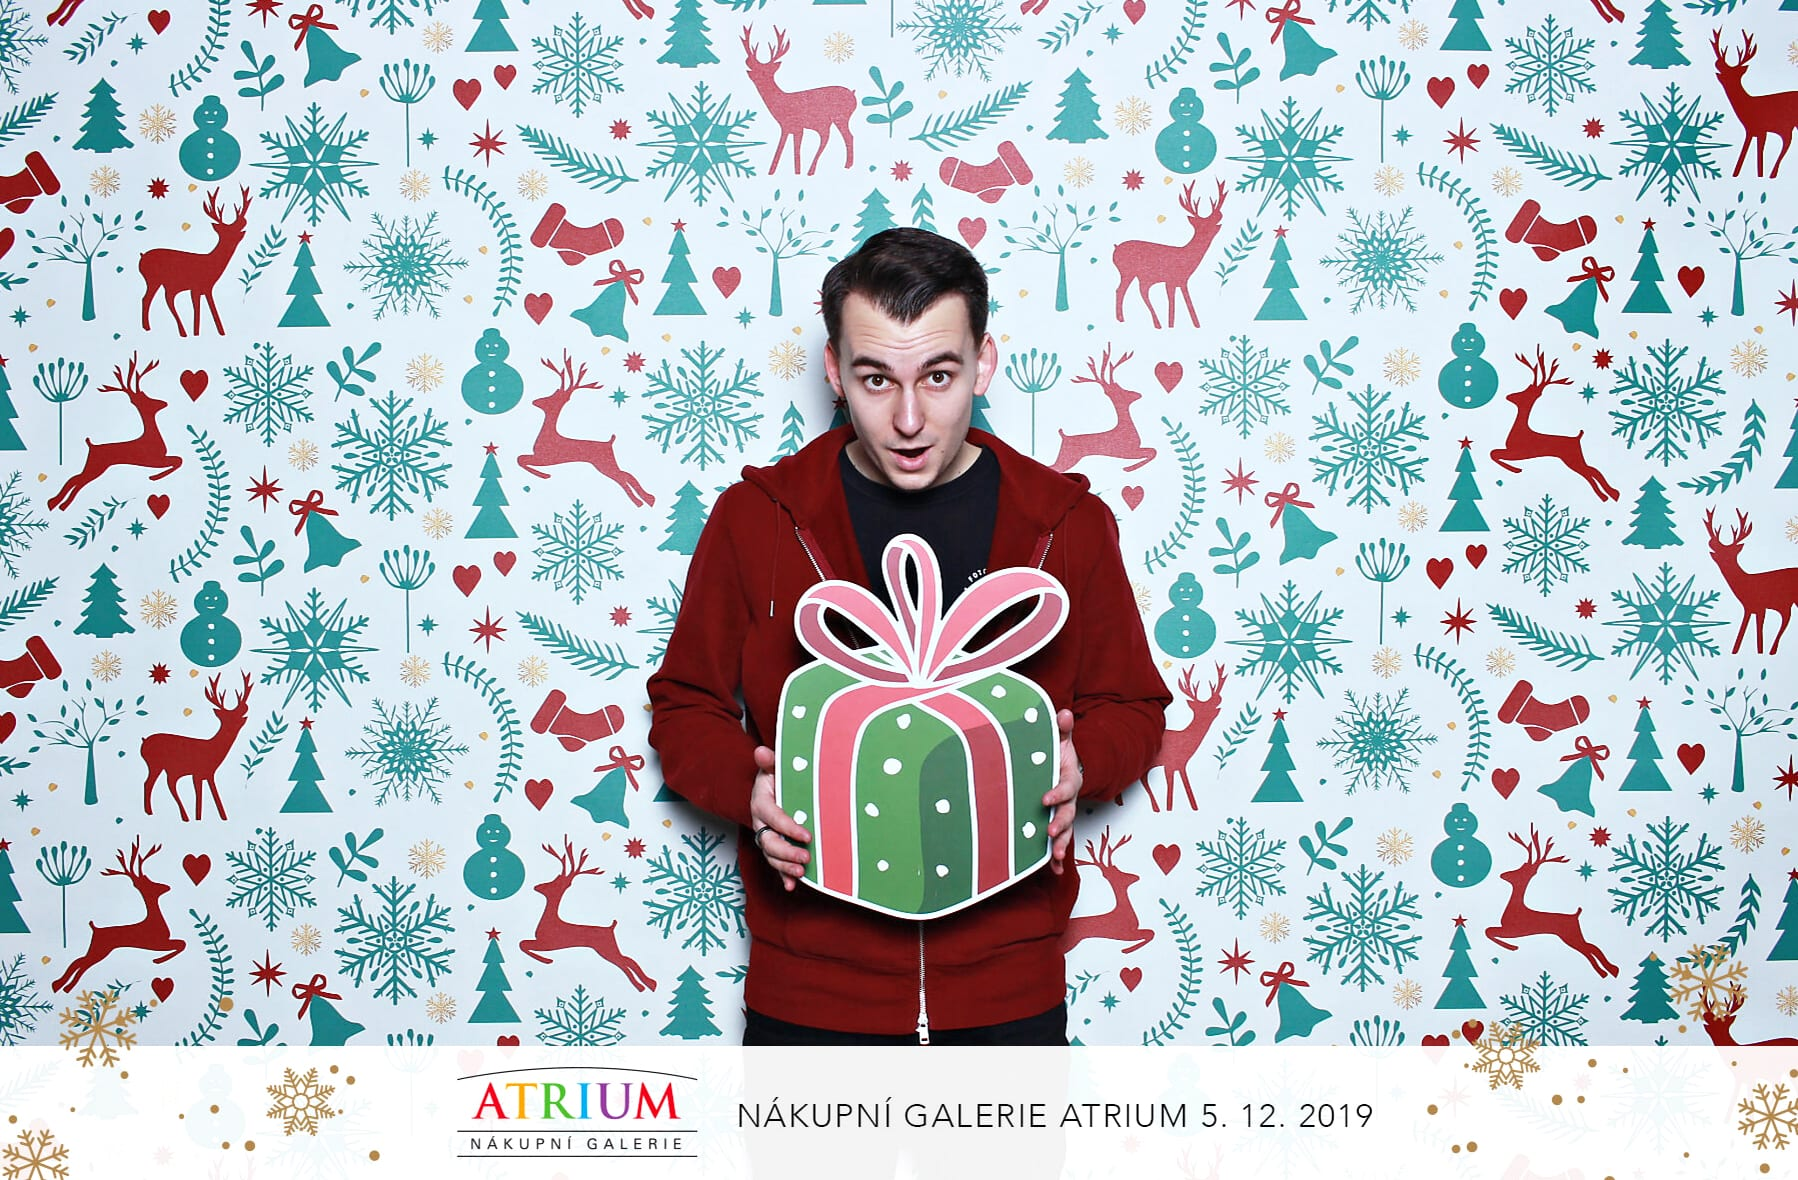 fotokoutek-praha-promo-akce-atrium-5-12-2019-681147